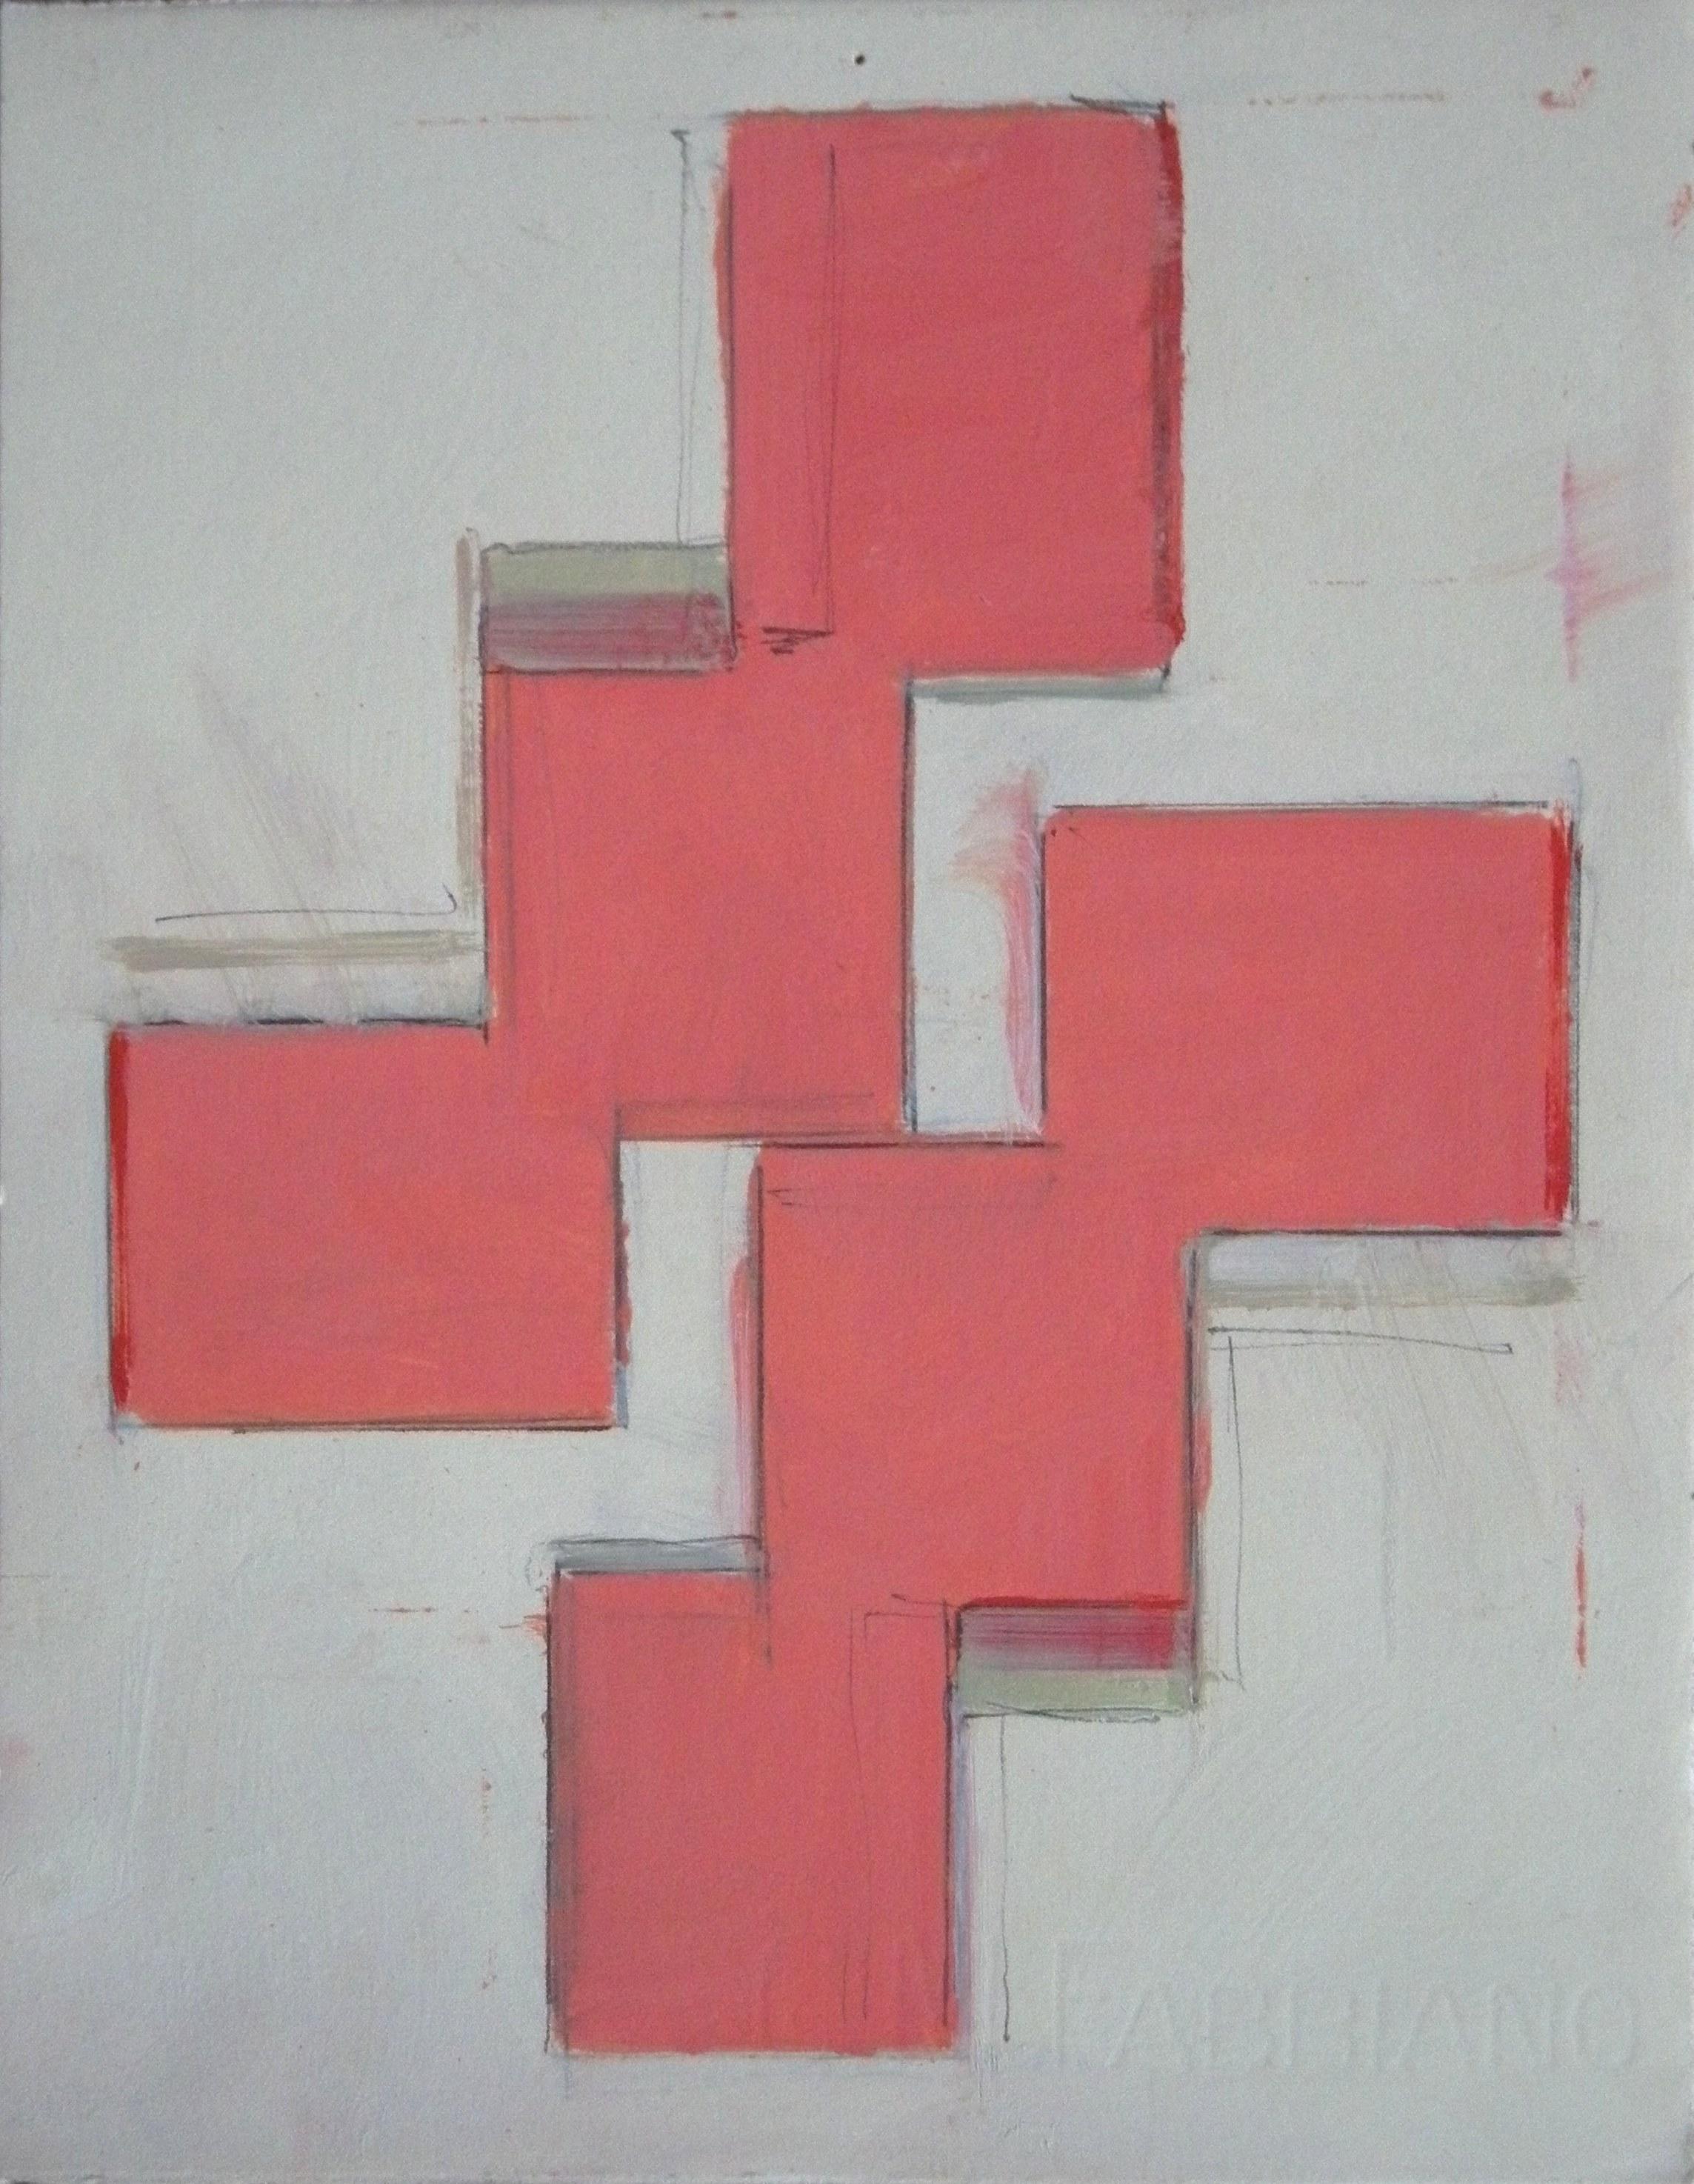 Roberto Caracciolo - study for Illuminata IV